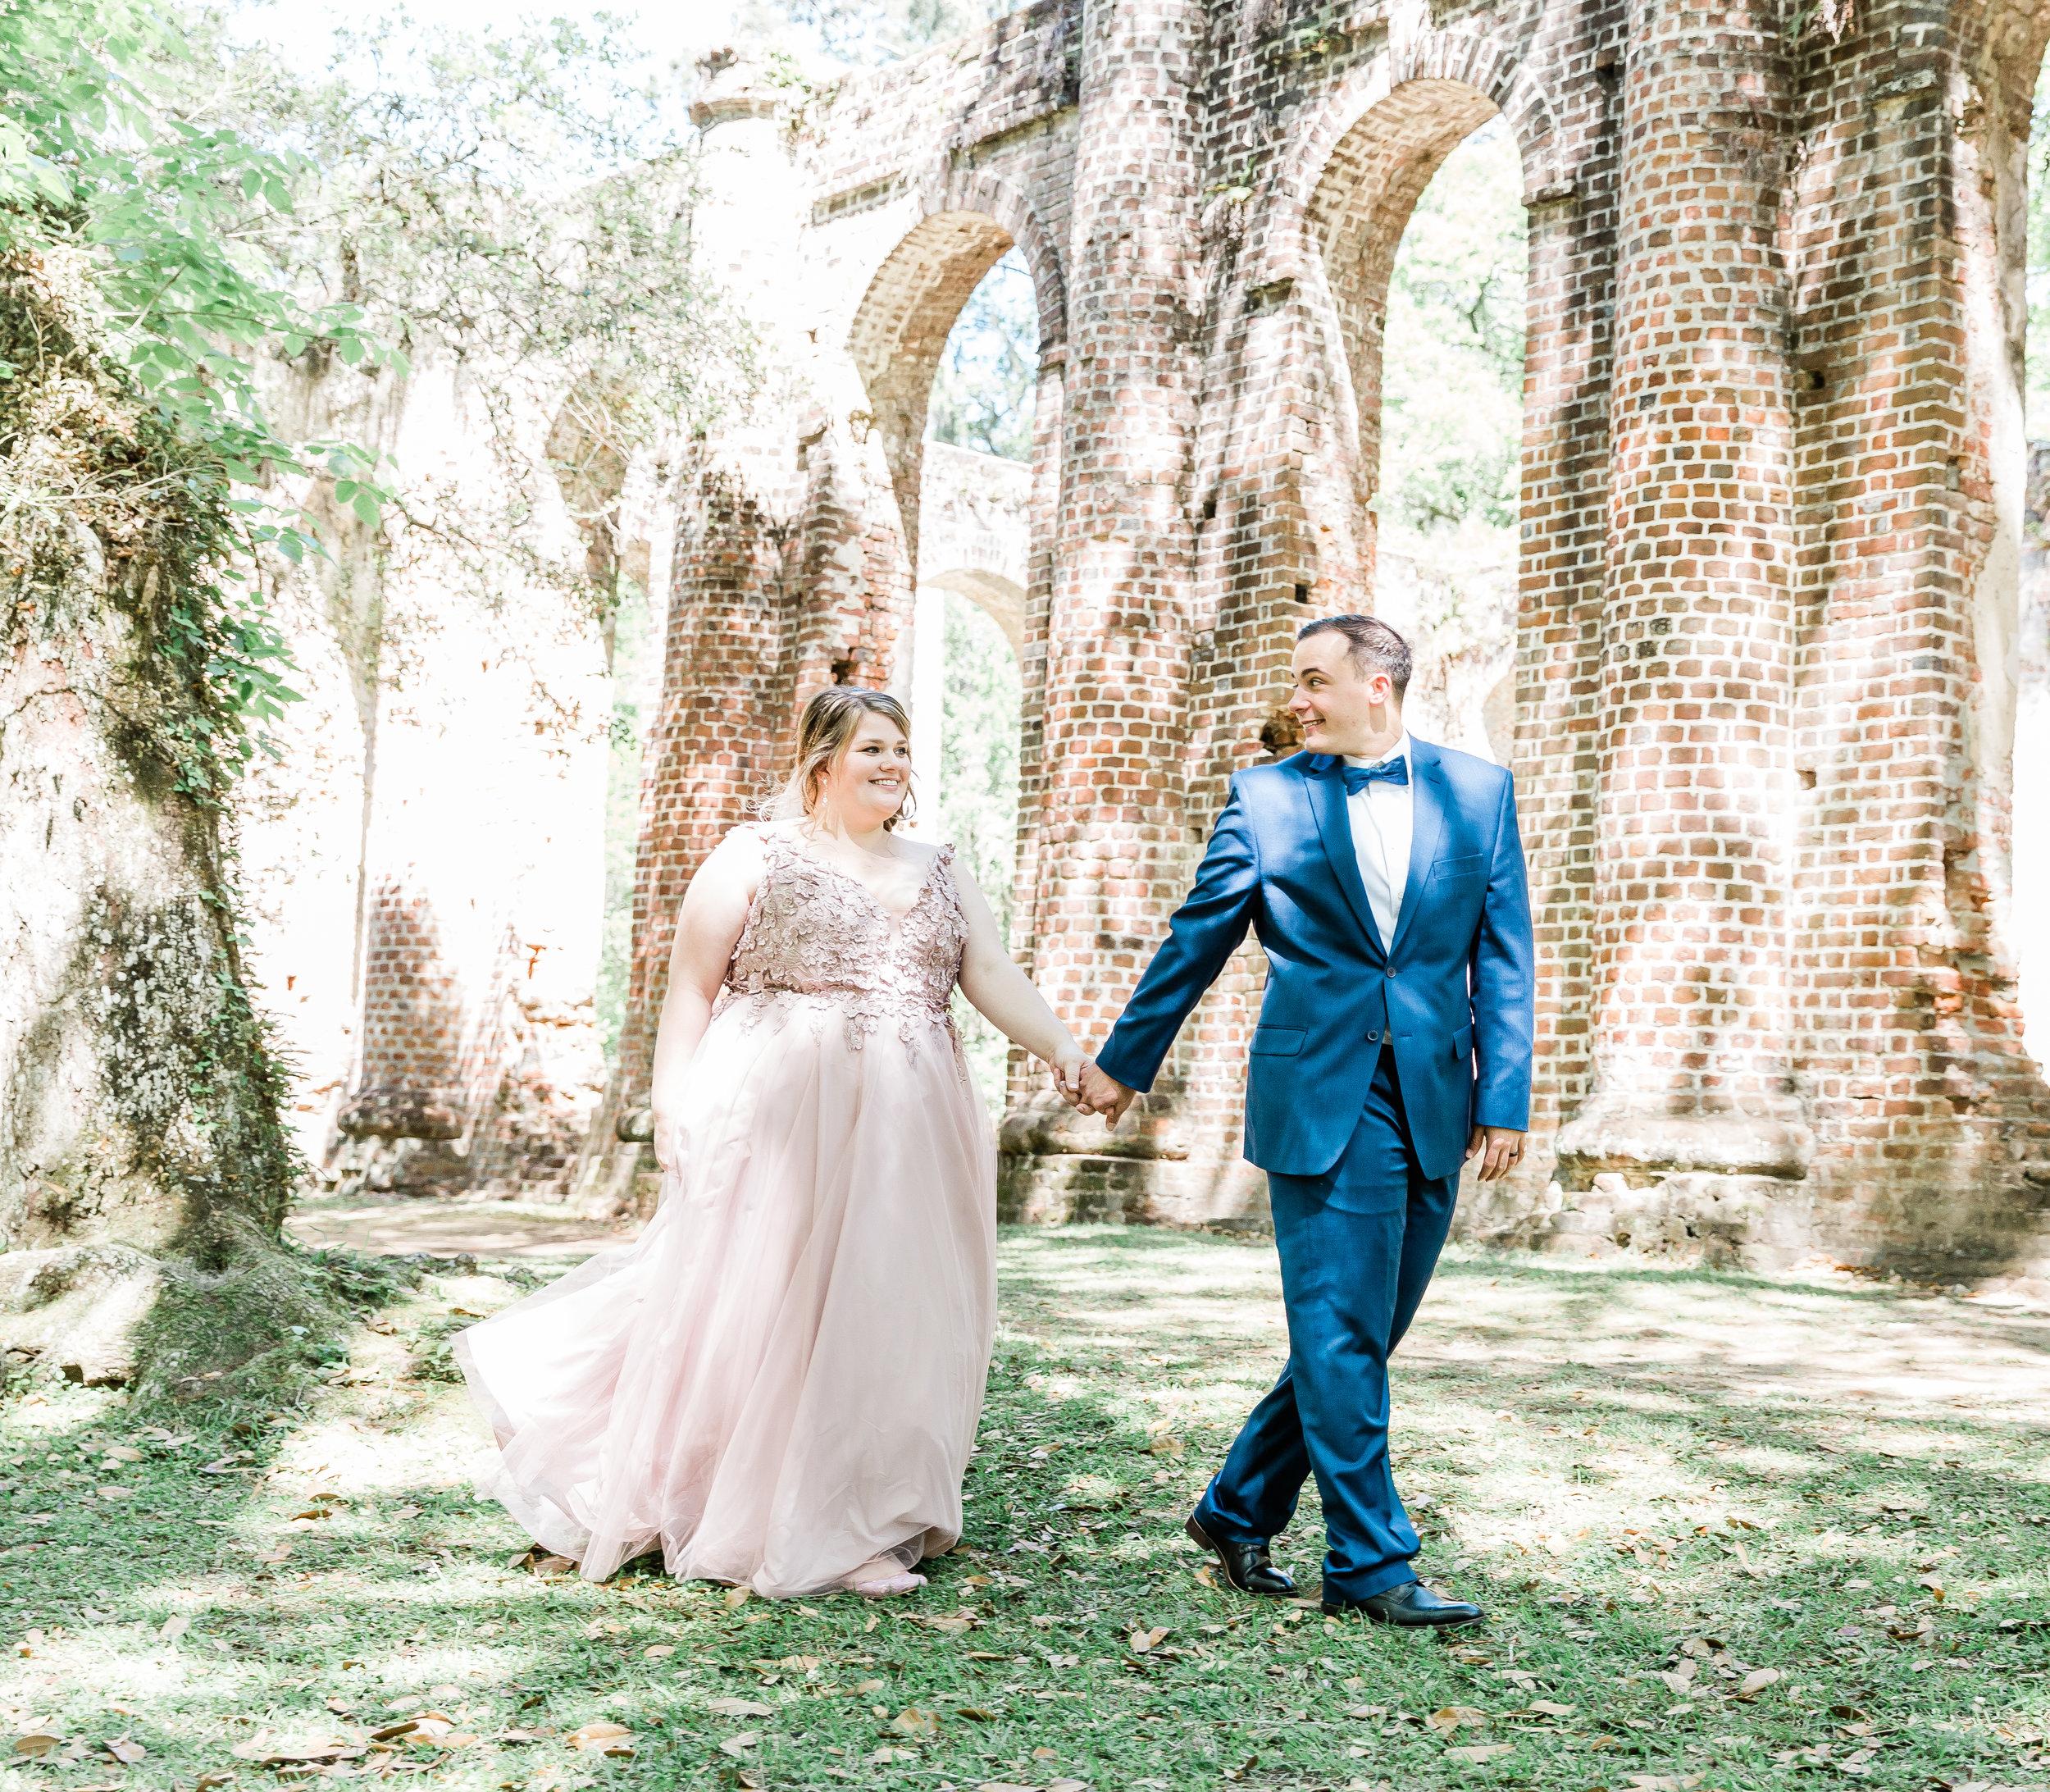 20190417-Southern Lens Photography-savannah family photographer- Ashley and Zack-old sheldon church ruins-201947.jpg